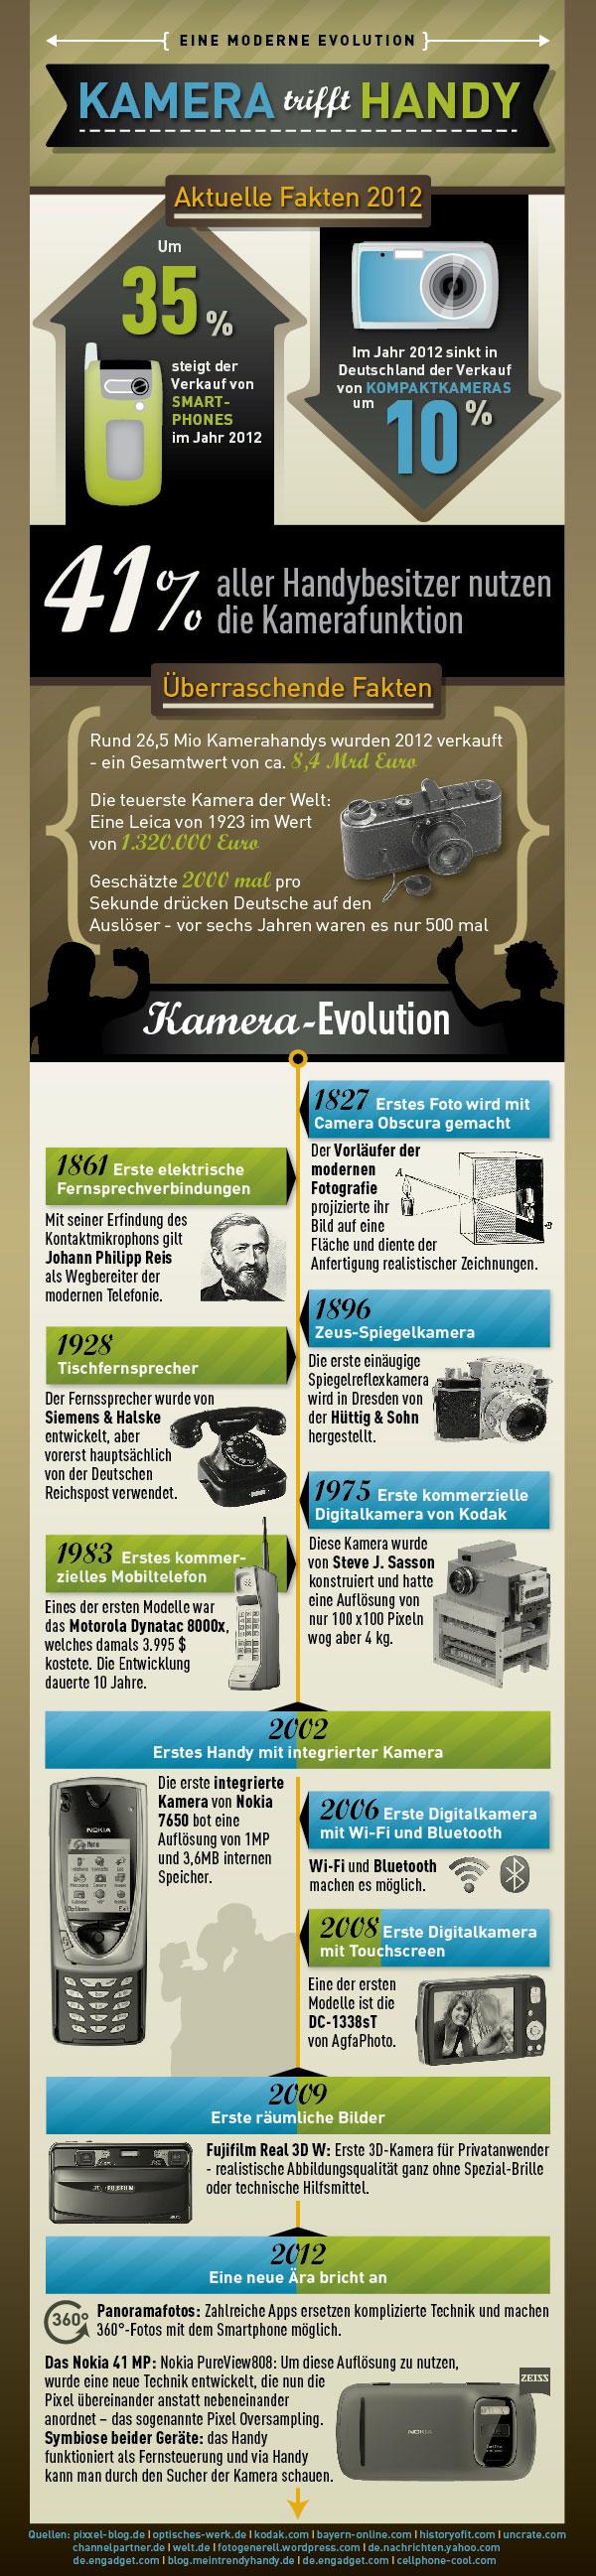 kamera_vs_handy_infografik